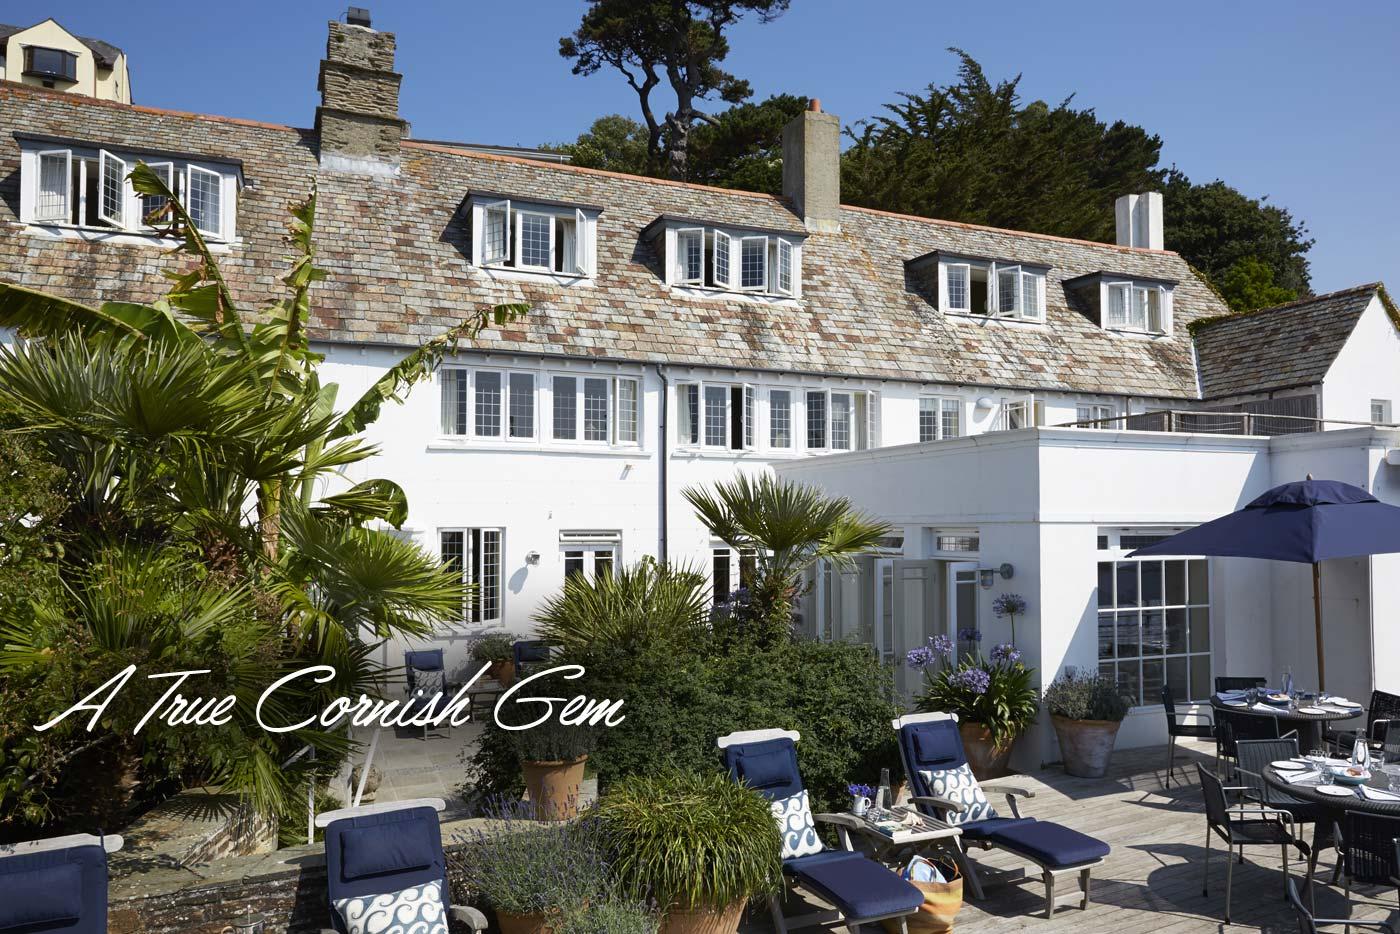 Experiencing Some Traditional Cornish Comforts at Hotel Tresanton